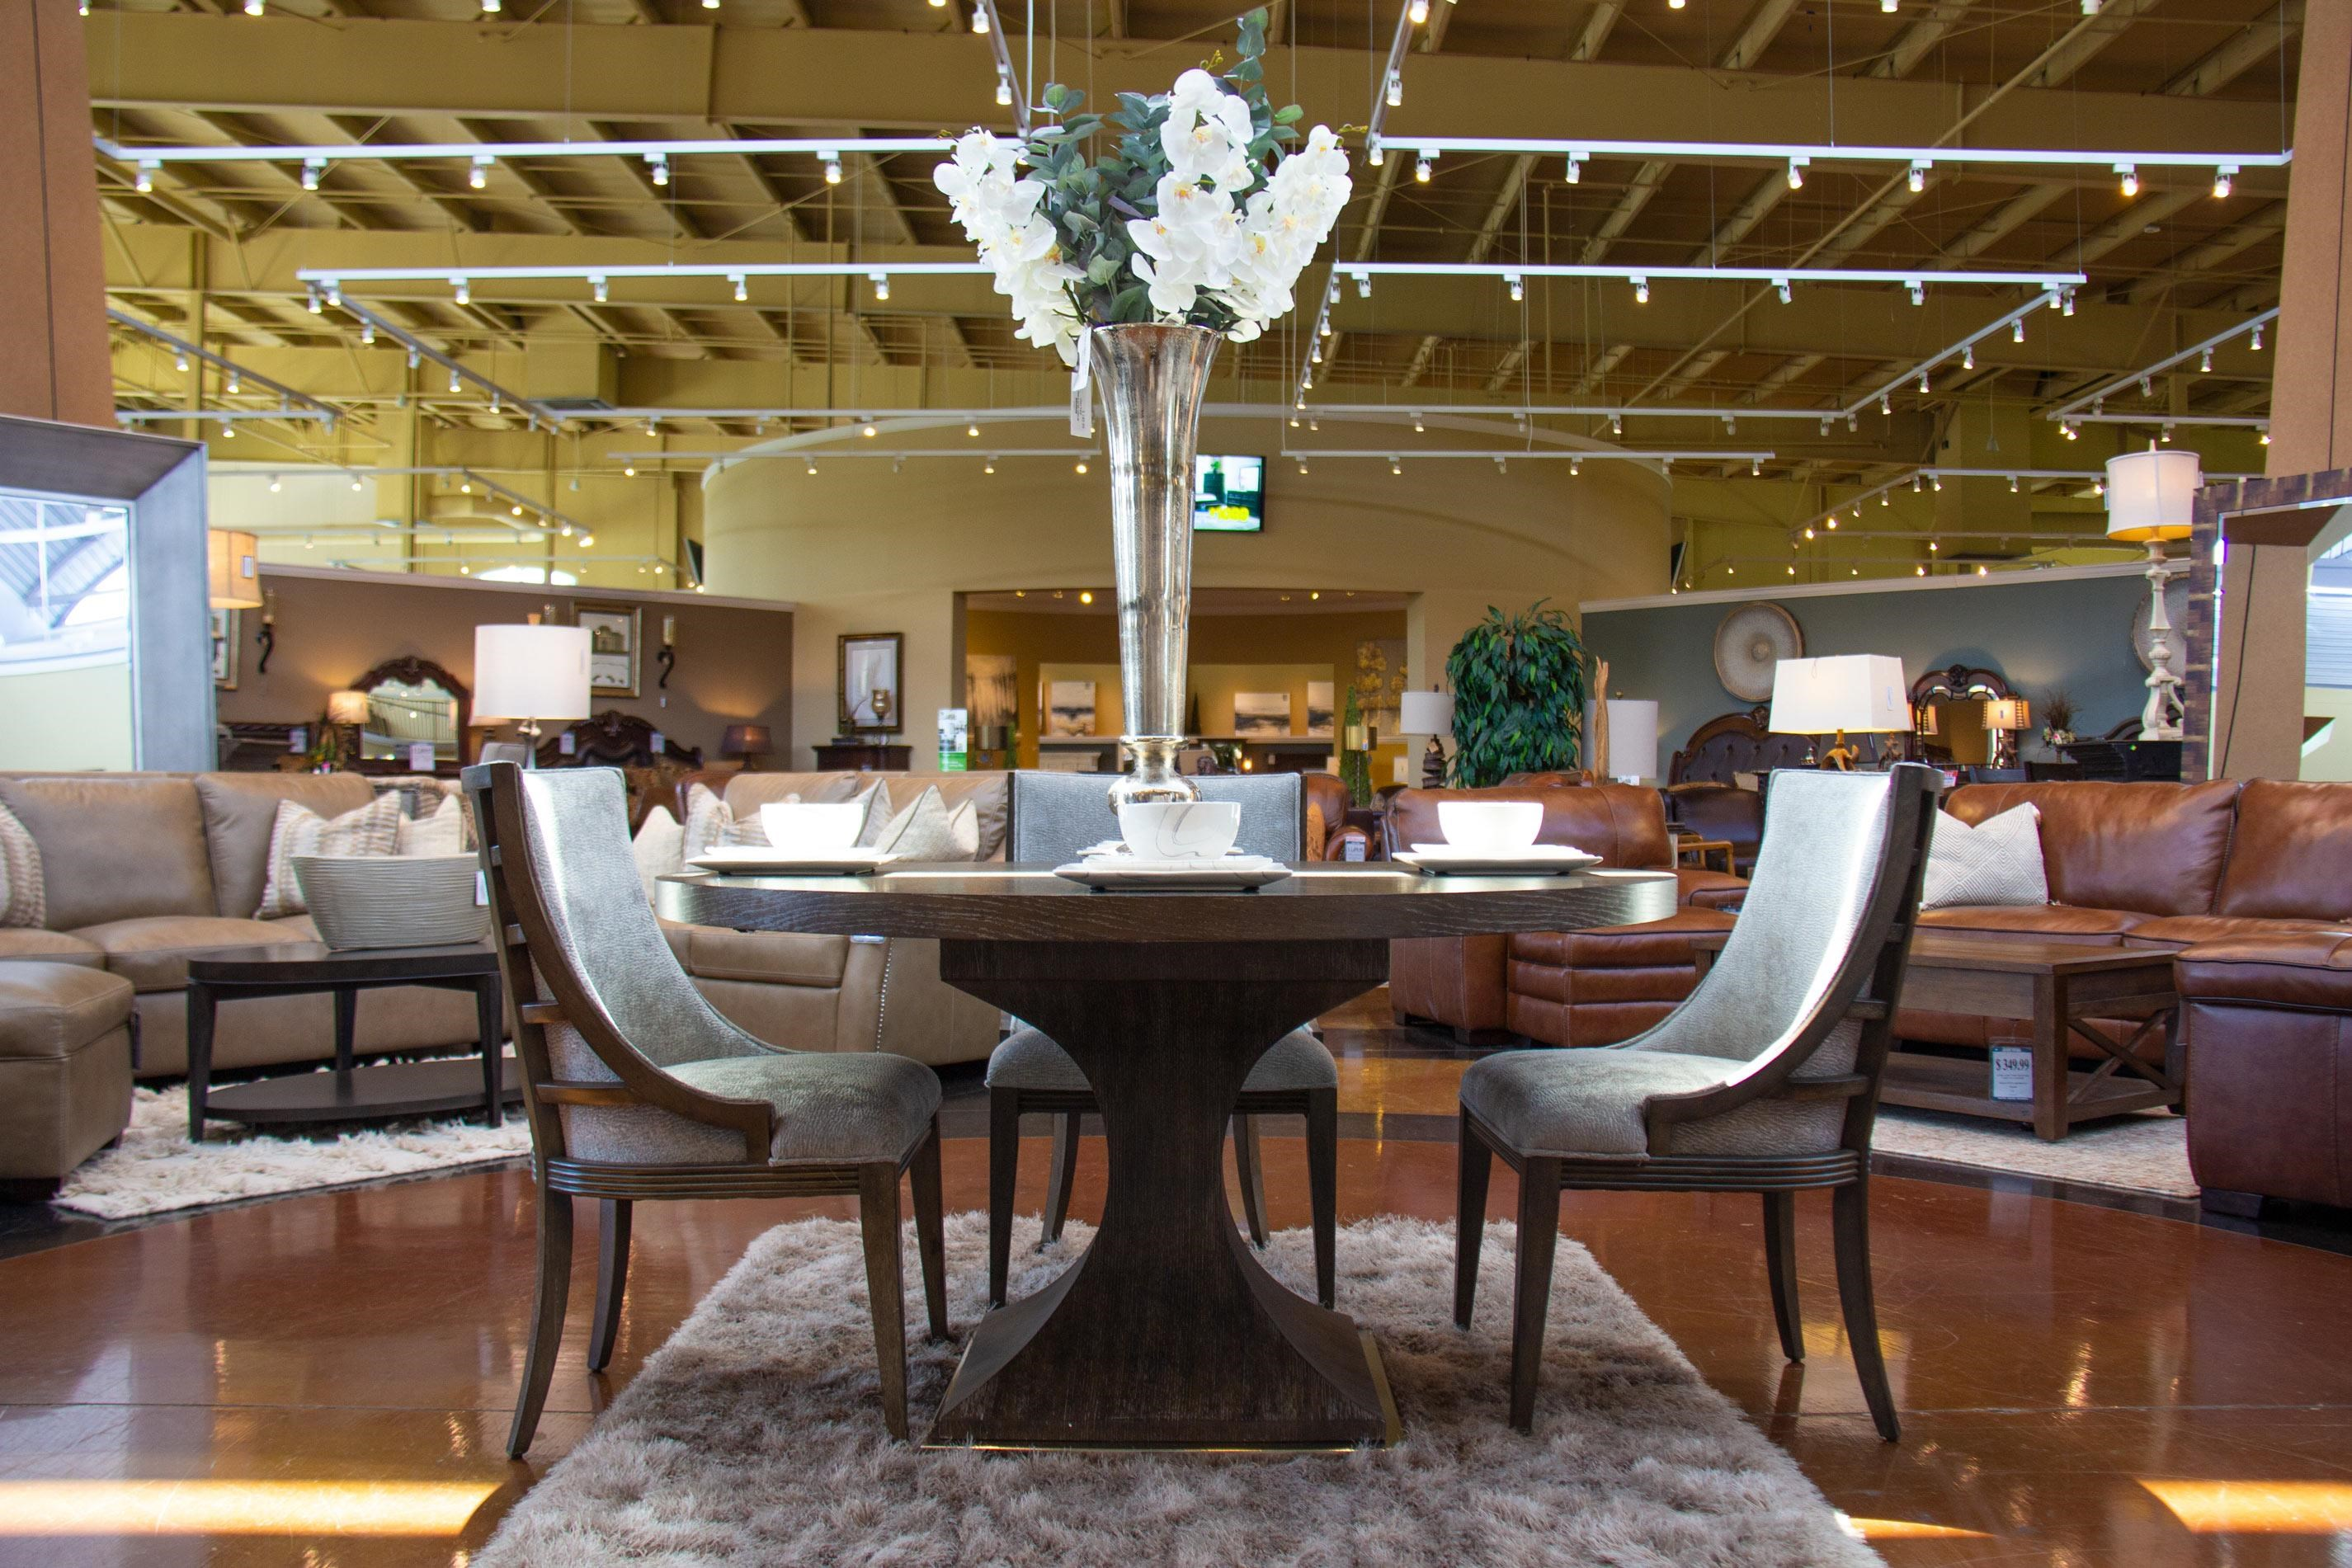 Pedestal Dining Table & 4 Upholstered Dining